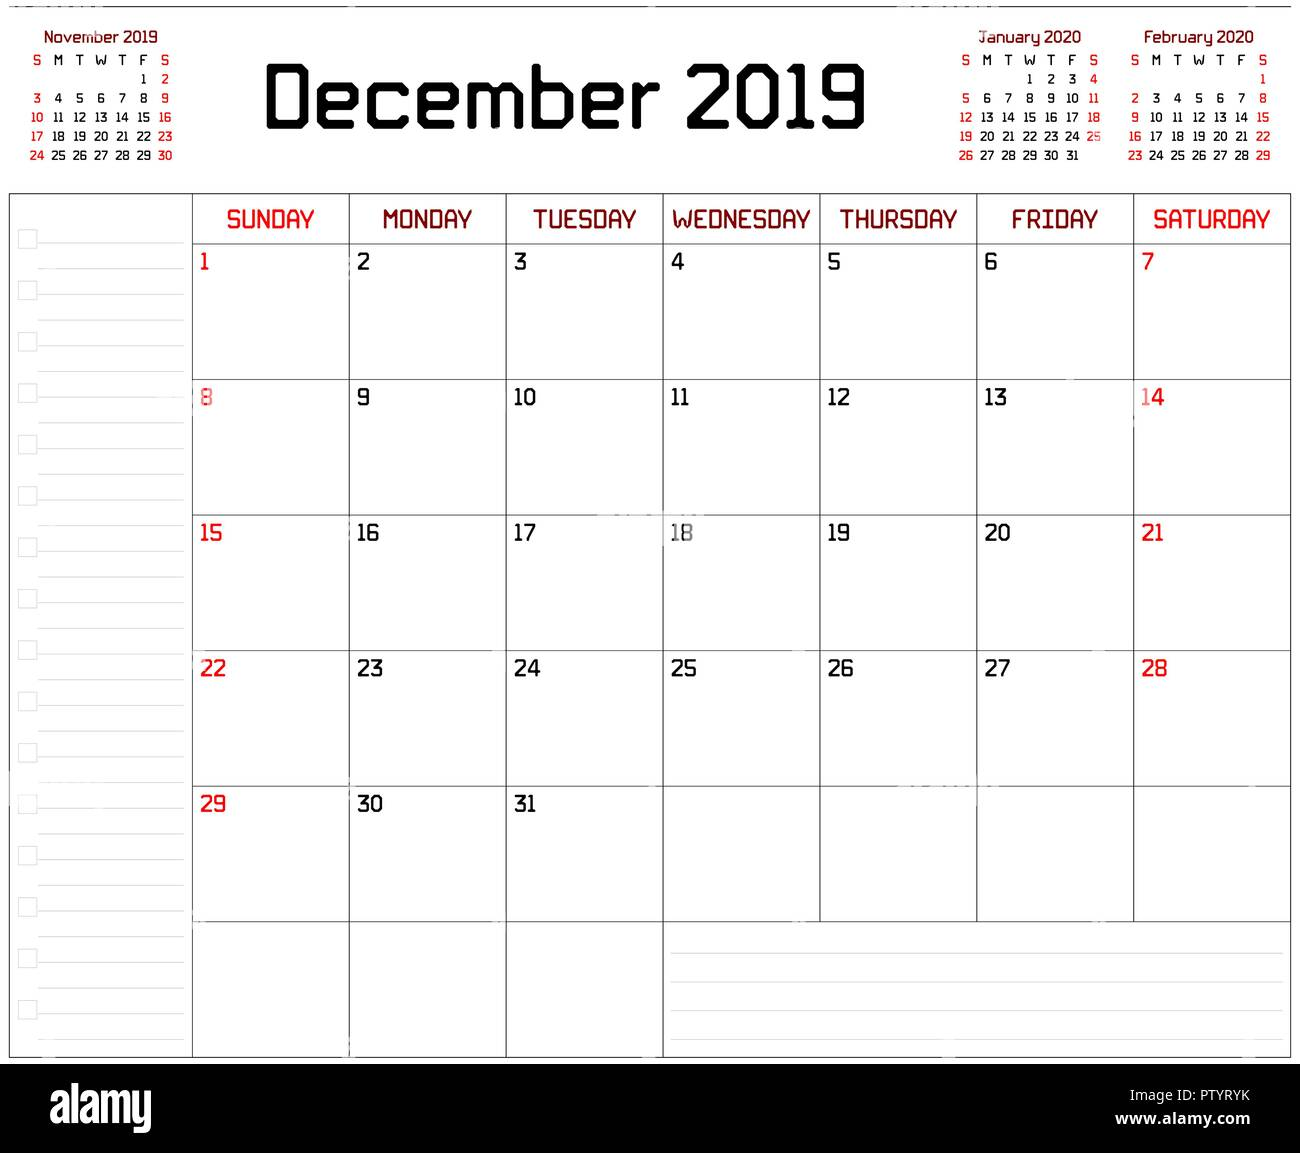 Calendario Mese Dicembre 2019.Un Pianificatore Mensile Calendario Per Il Mese Di Dicembre